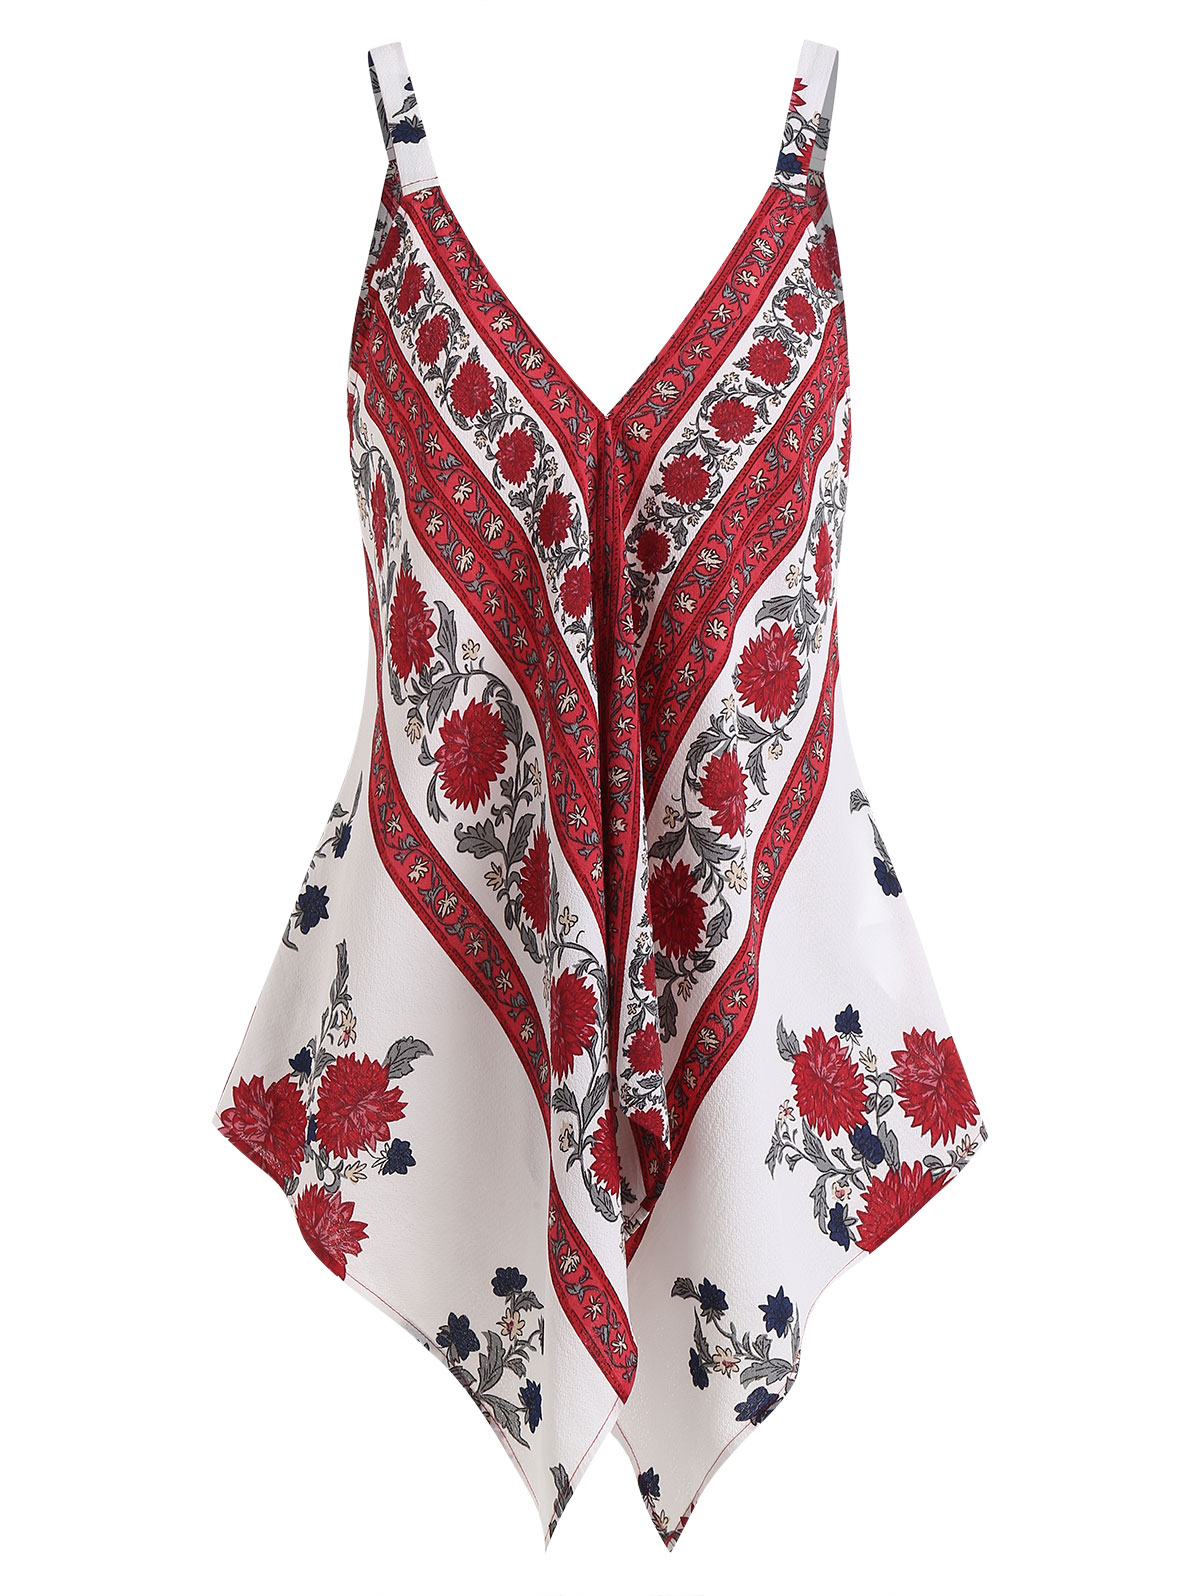 Wipalo Low Cut Asymmetric Floral Top Asymmetric Draped Floral Handkerchief Summer Women Ladies Tanks Top Floral Tees